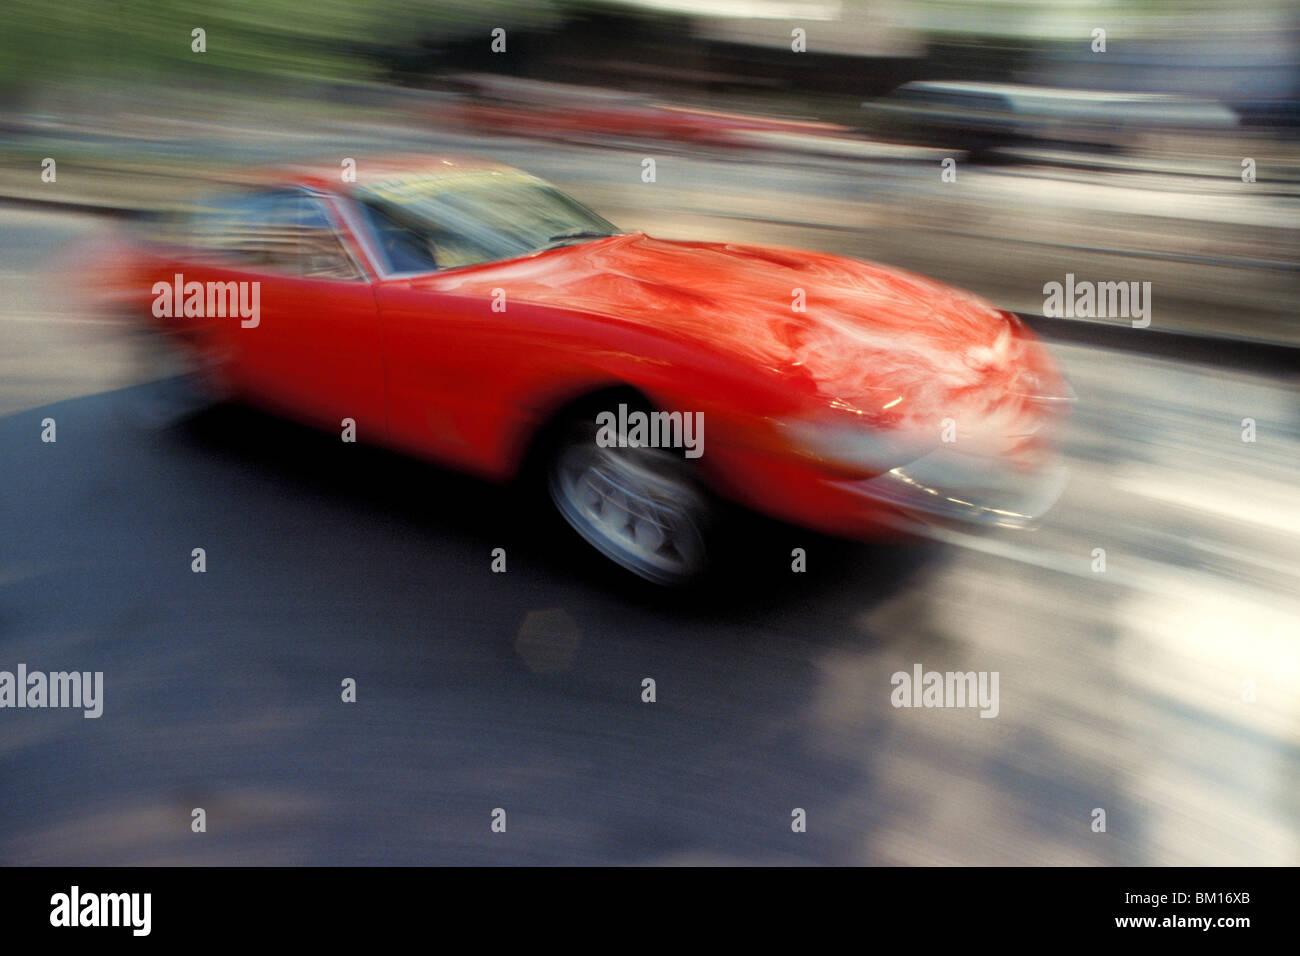 4 365 Stock Photos Images Alamy 1971 Ferrari Daytona Engine Diagram Gtb Sports Cars Meeting Maranello Modena